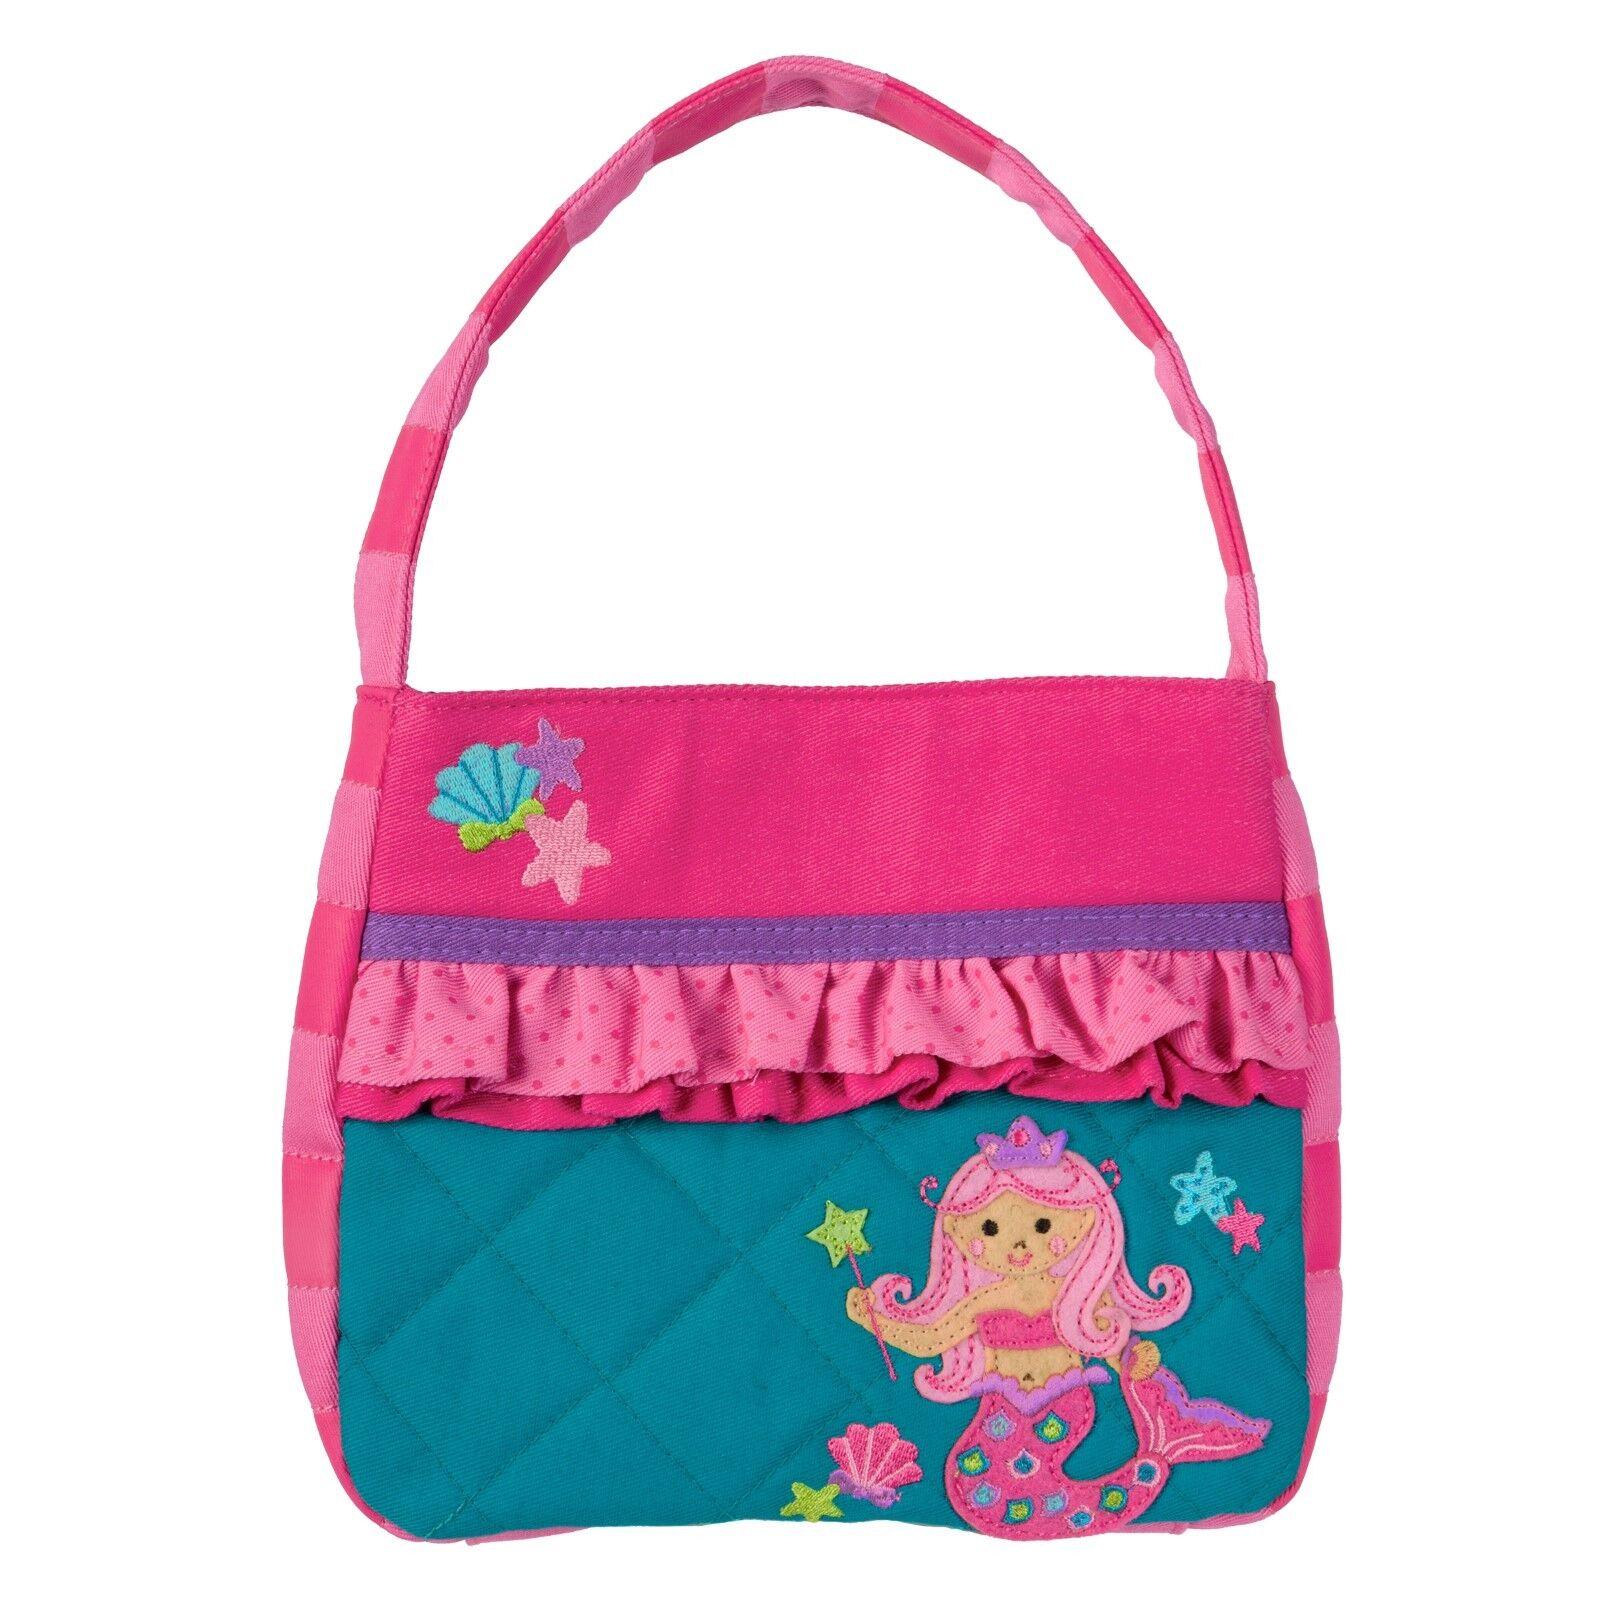 Cute Cat Girls Purse handbag Children Kid Cross-body shoulder bag Christmas O8K8